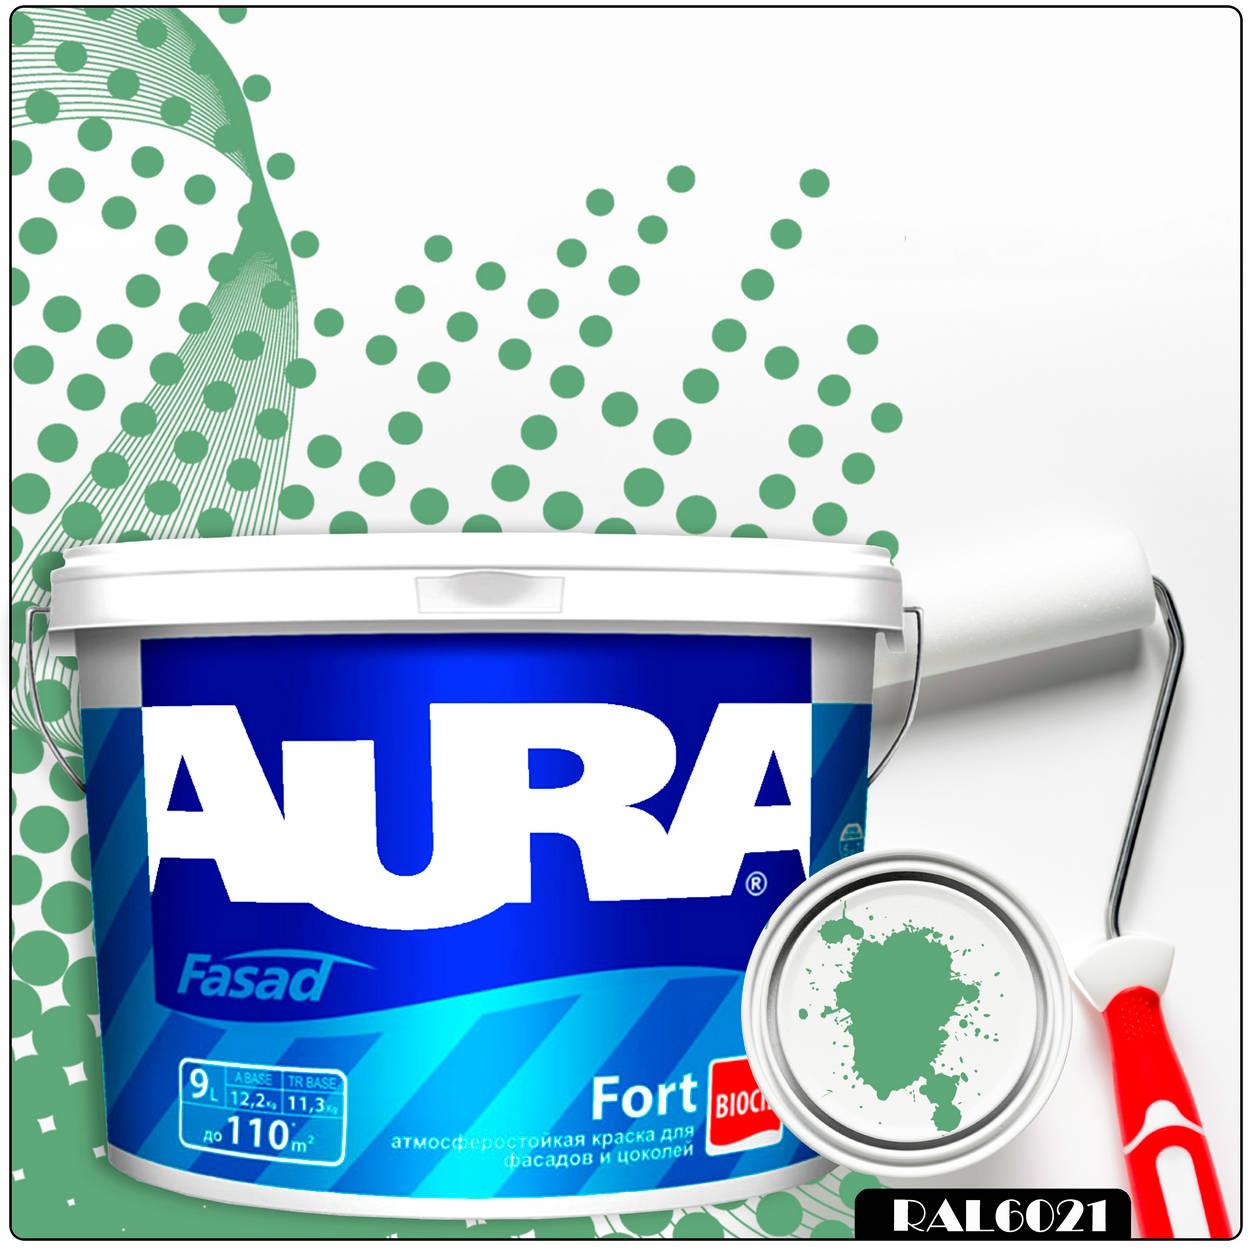 Фото 22 - Краска Aura Fasad Fort, RAL 6021 Бледно-зеленый, латексная, матовая, для фасада и цоколей, 9л, Аура.